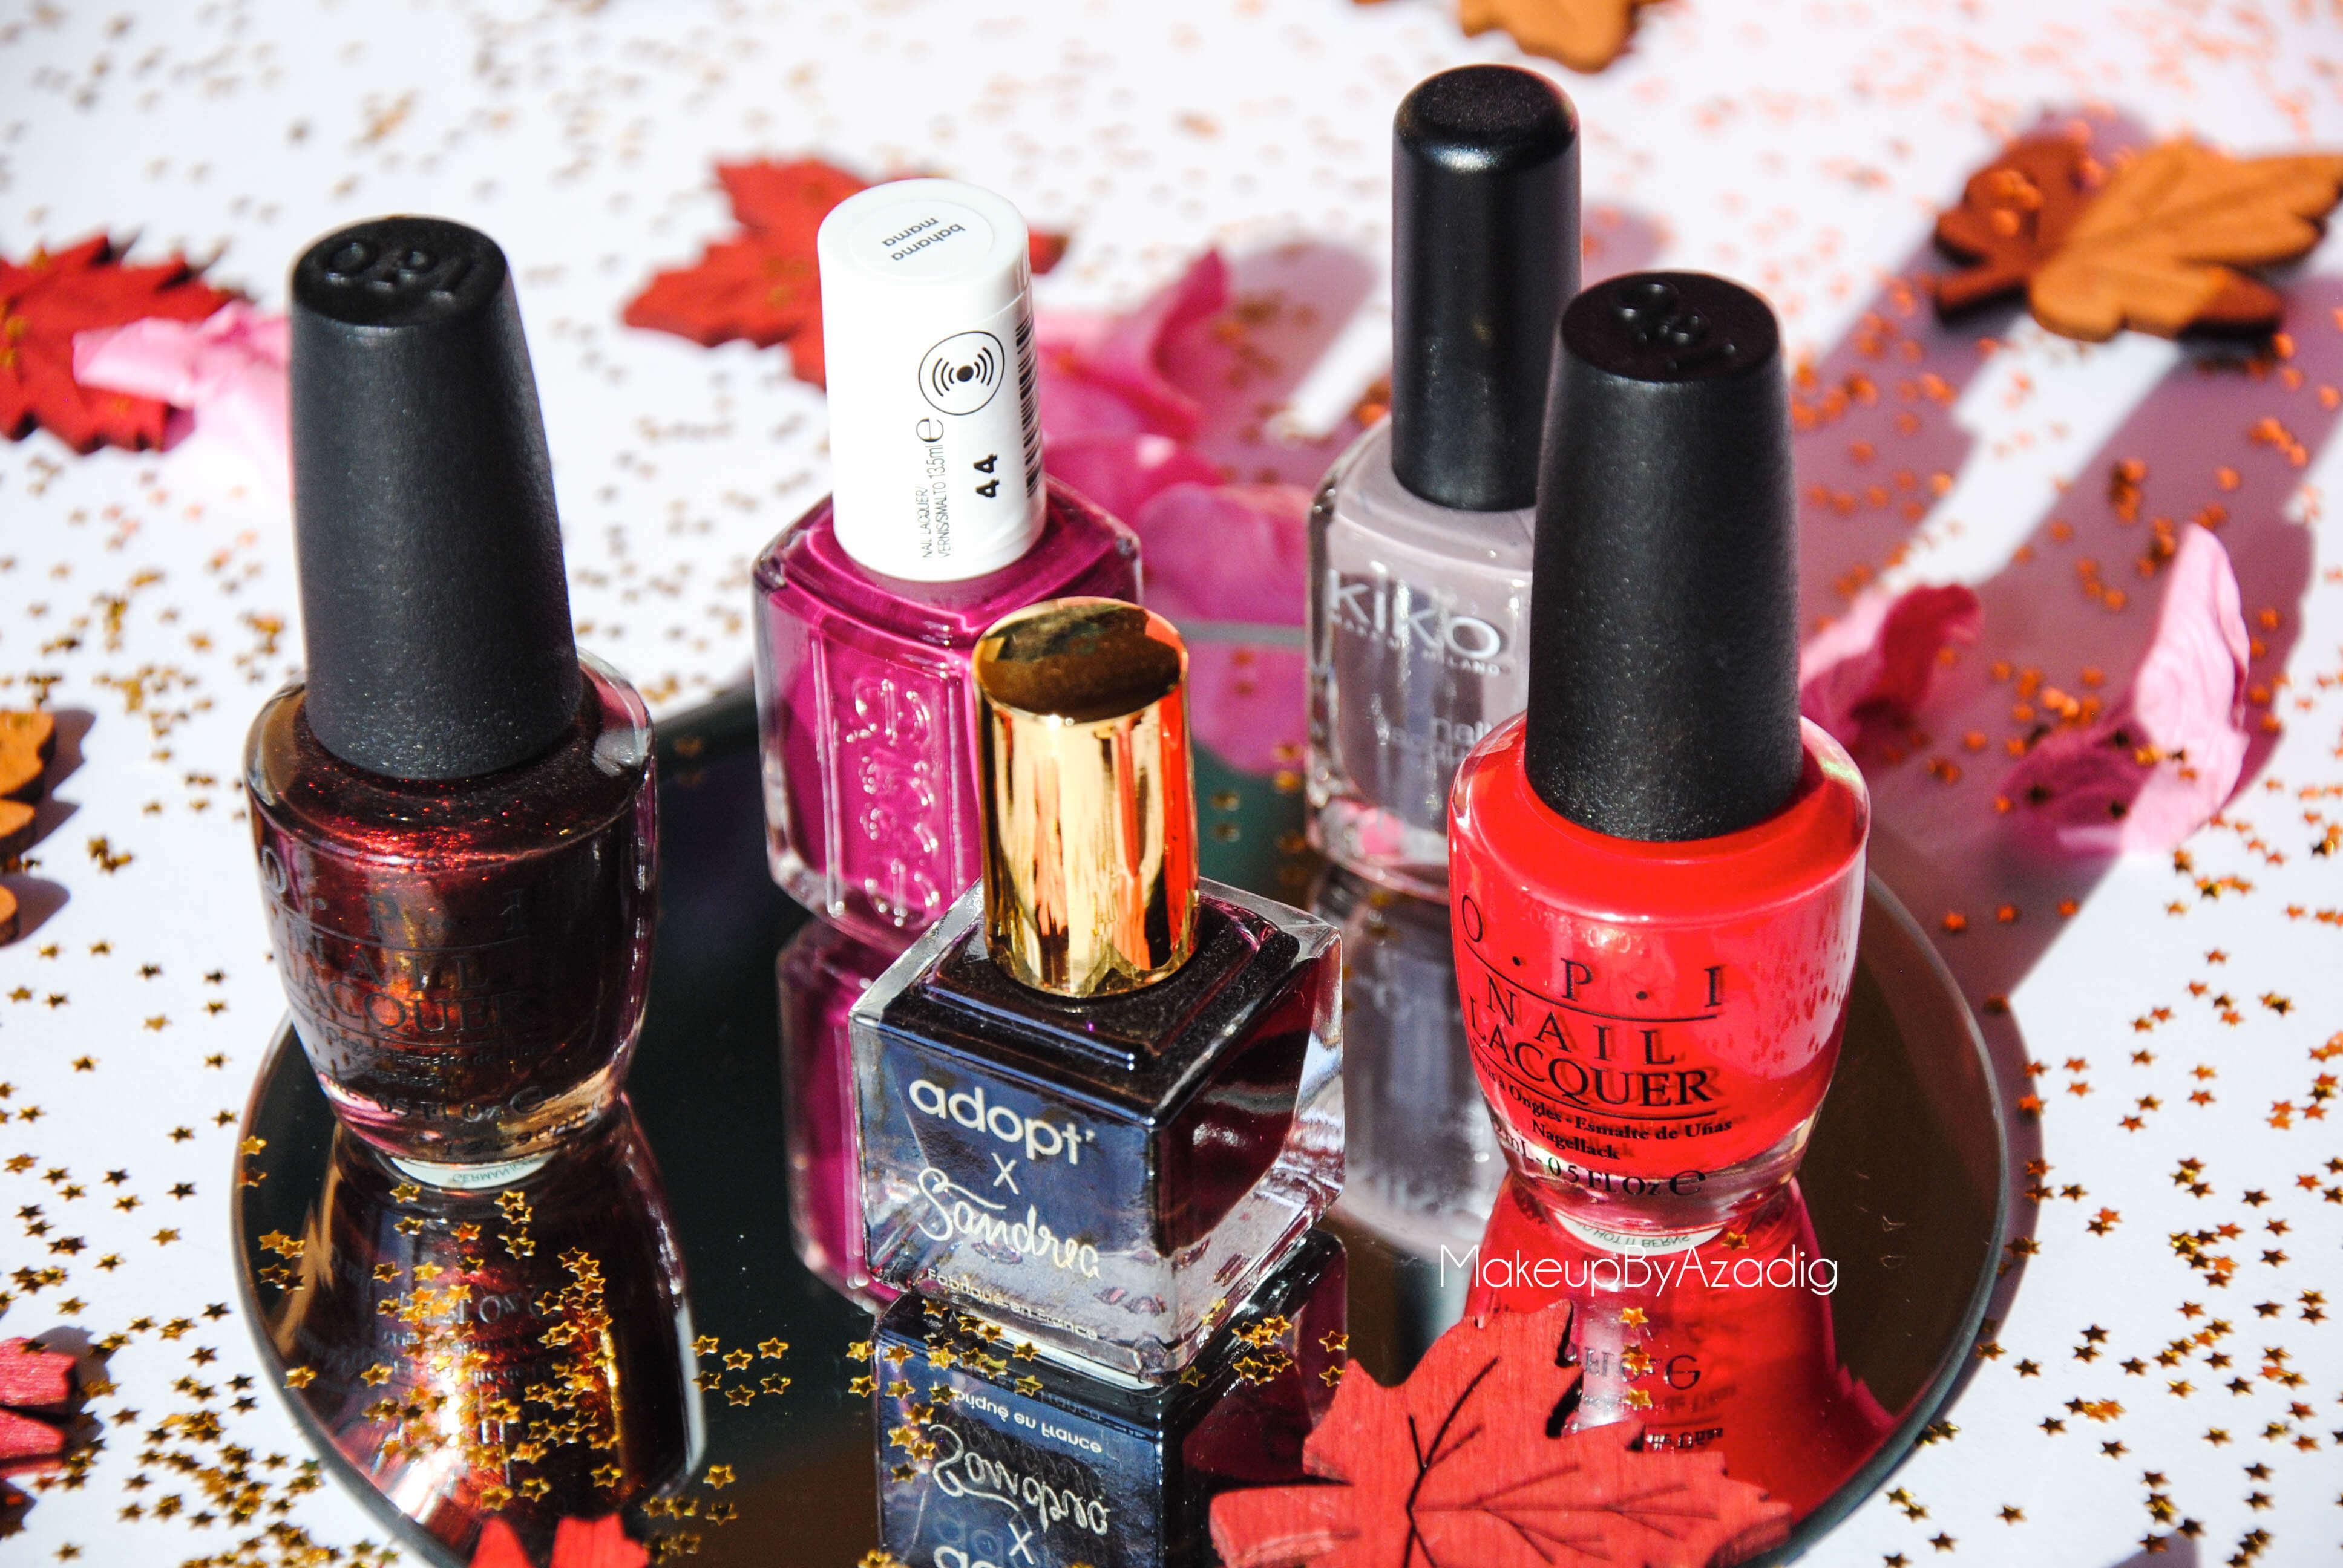 makeupbyazadig-vernis-tendance-automne-nails-autumn-formula-x-monop-makeup-troyes-dijon-paris-sandrea26france-camaieu-opi-kiko-sephora-mavala-essie-miniature-blog